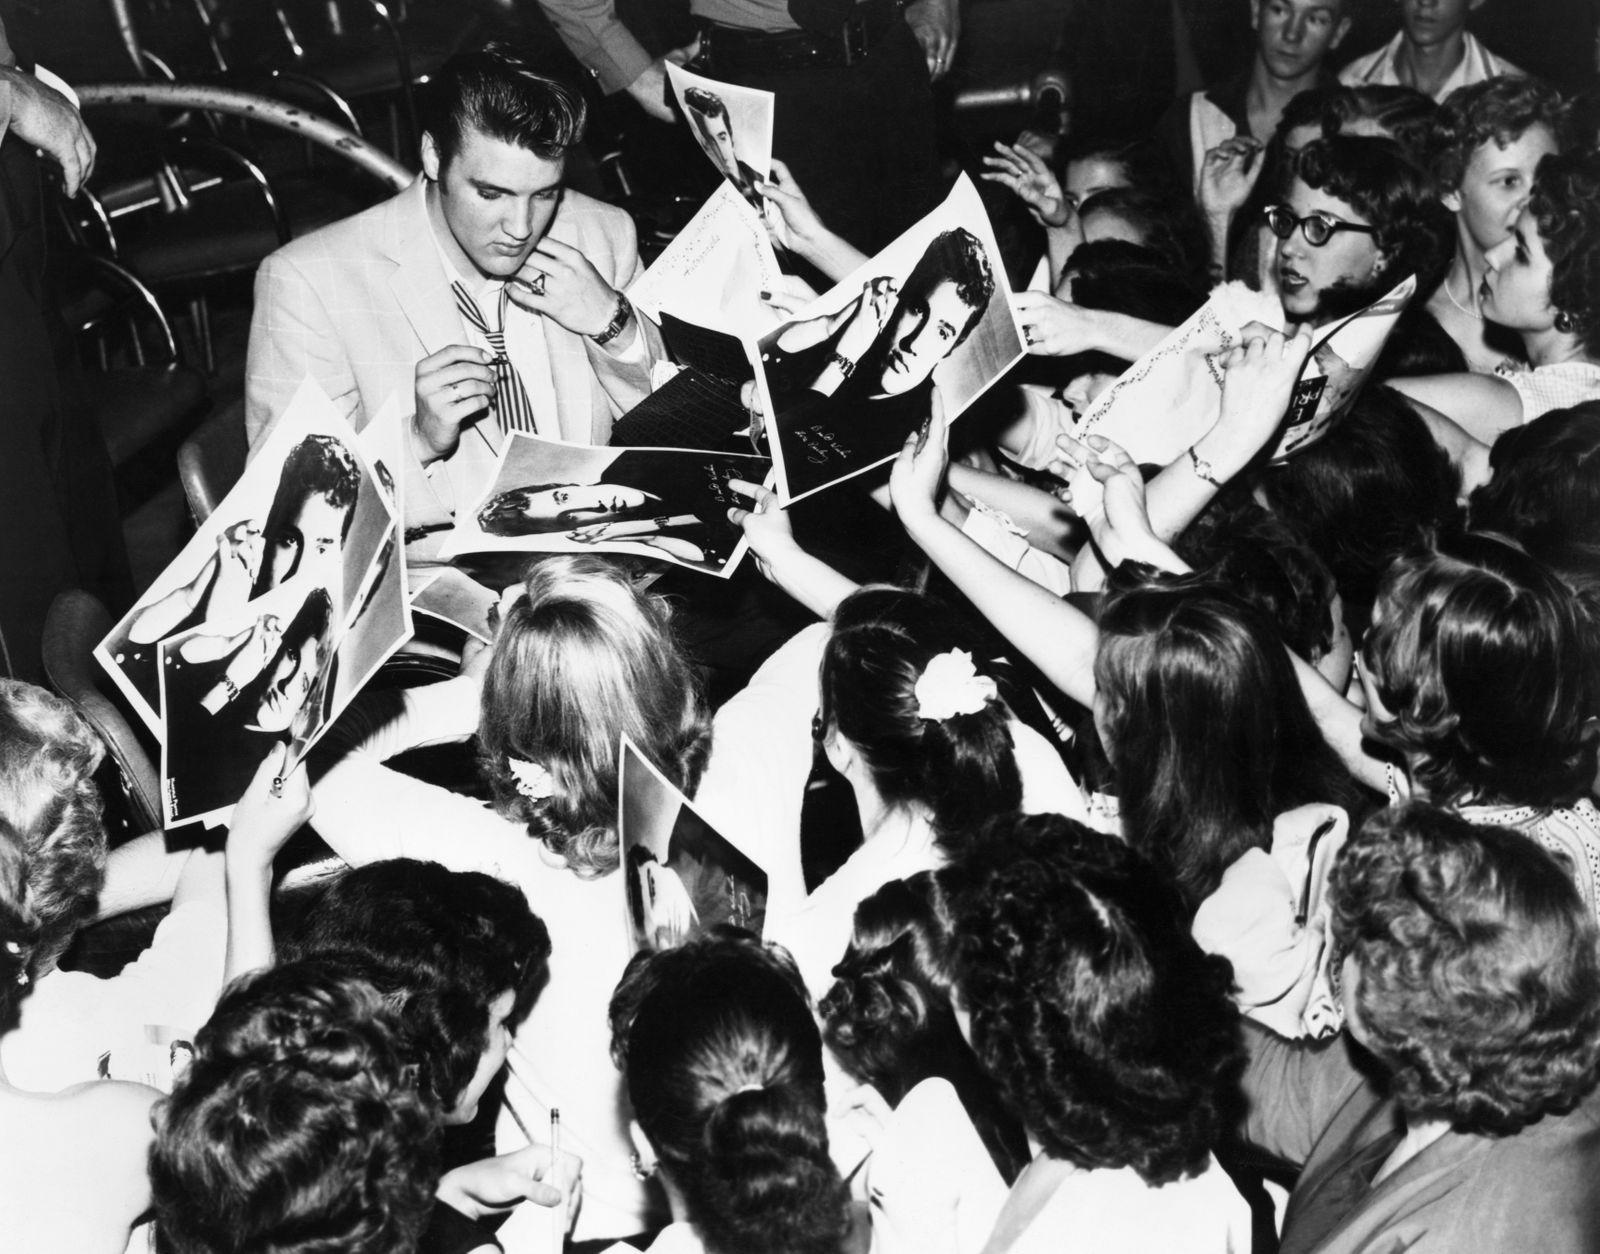 Elvis Presley Signing Autographs